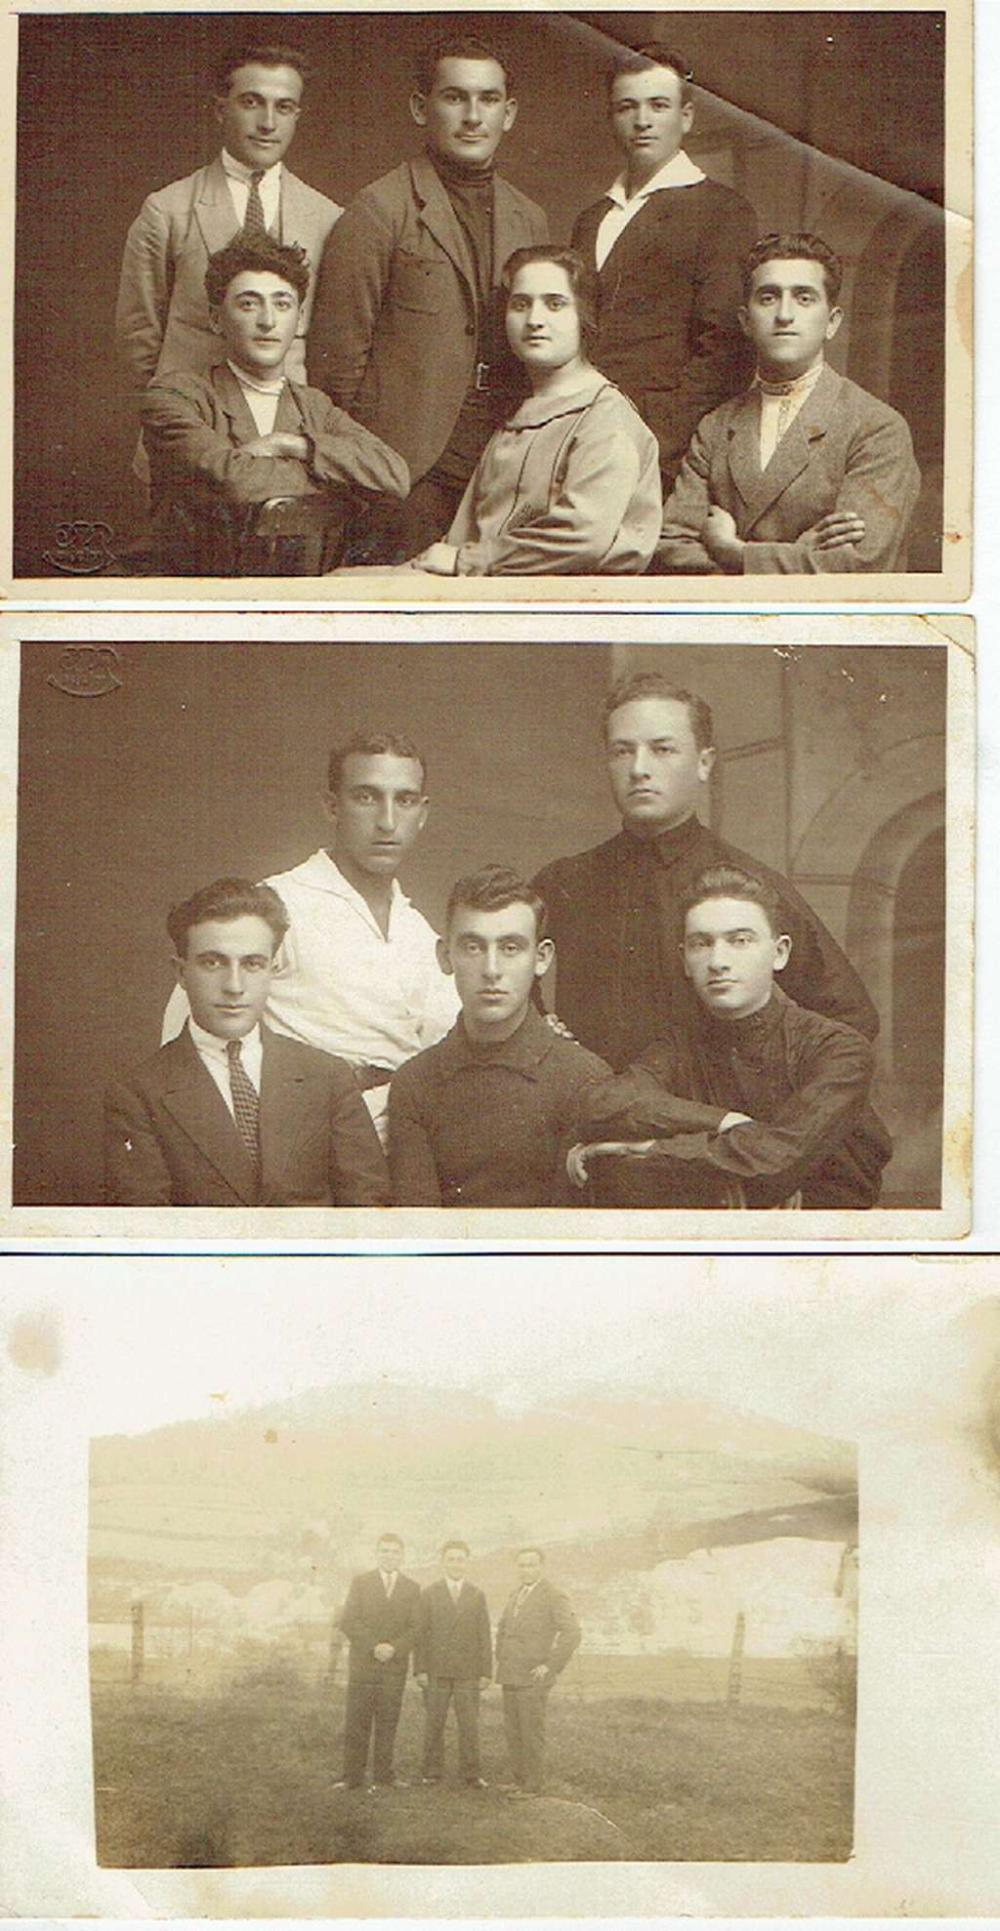 3 antique photos of Jewish activists in Palestine, Jerusalem, Golan Heights, stamp of photo studio in Jerusalem, 1920s.